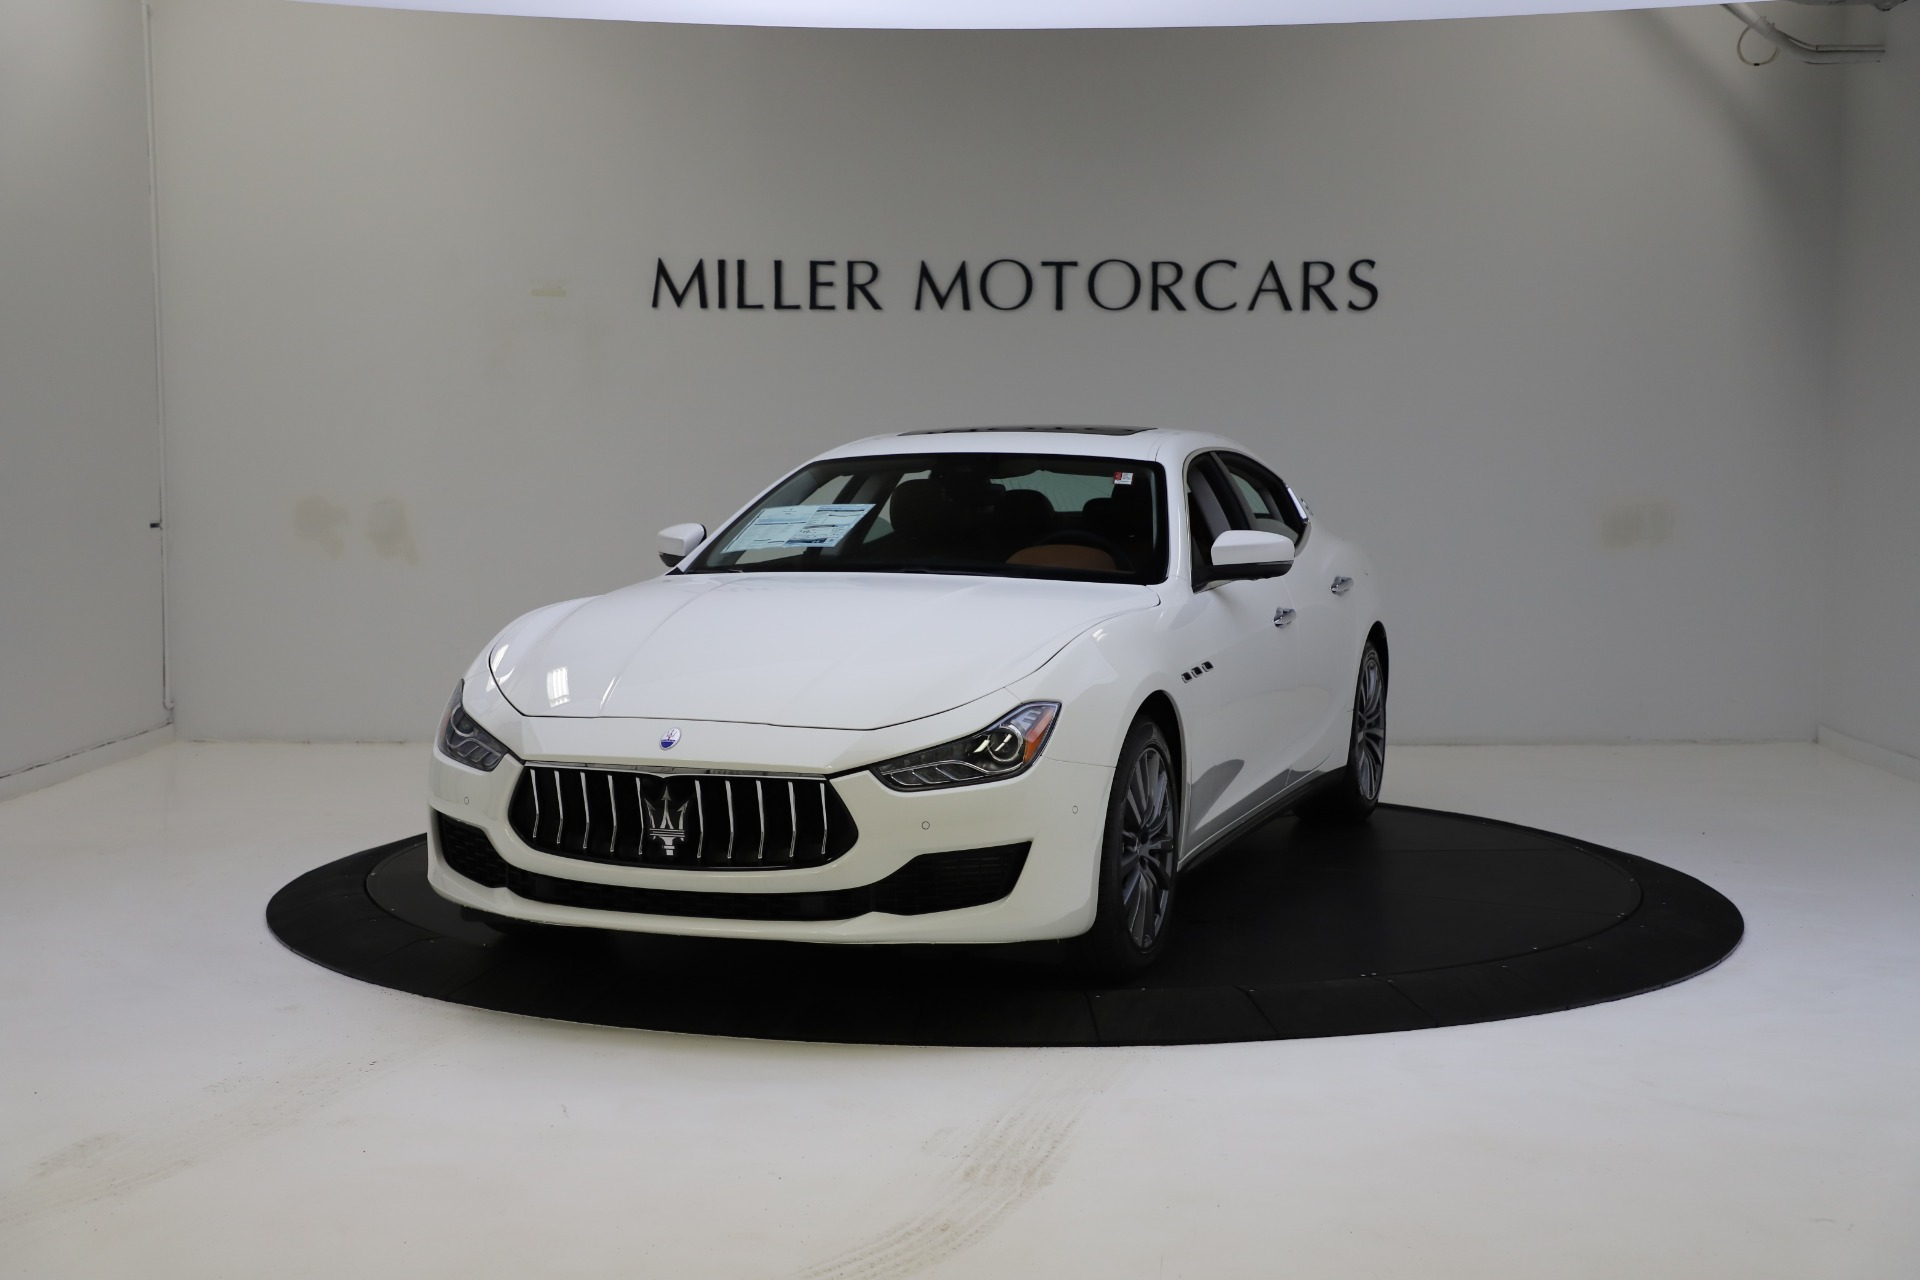 New 2021 Maserati Ghibli S Q4 for sale $85,754 at McLaren Greenwich in Greenwich CT 06830 1